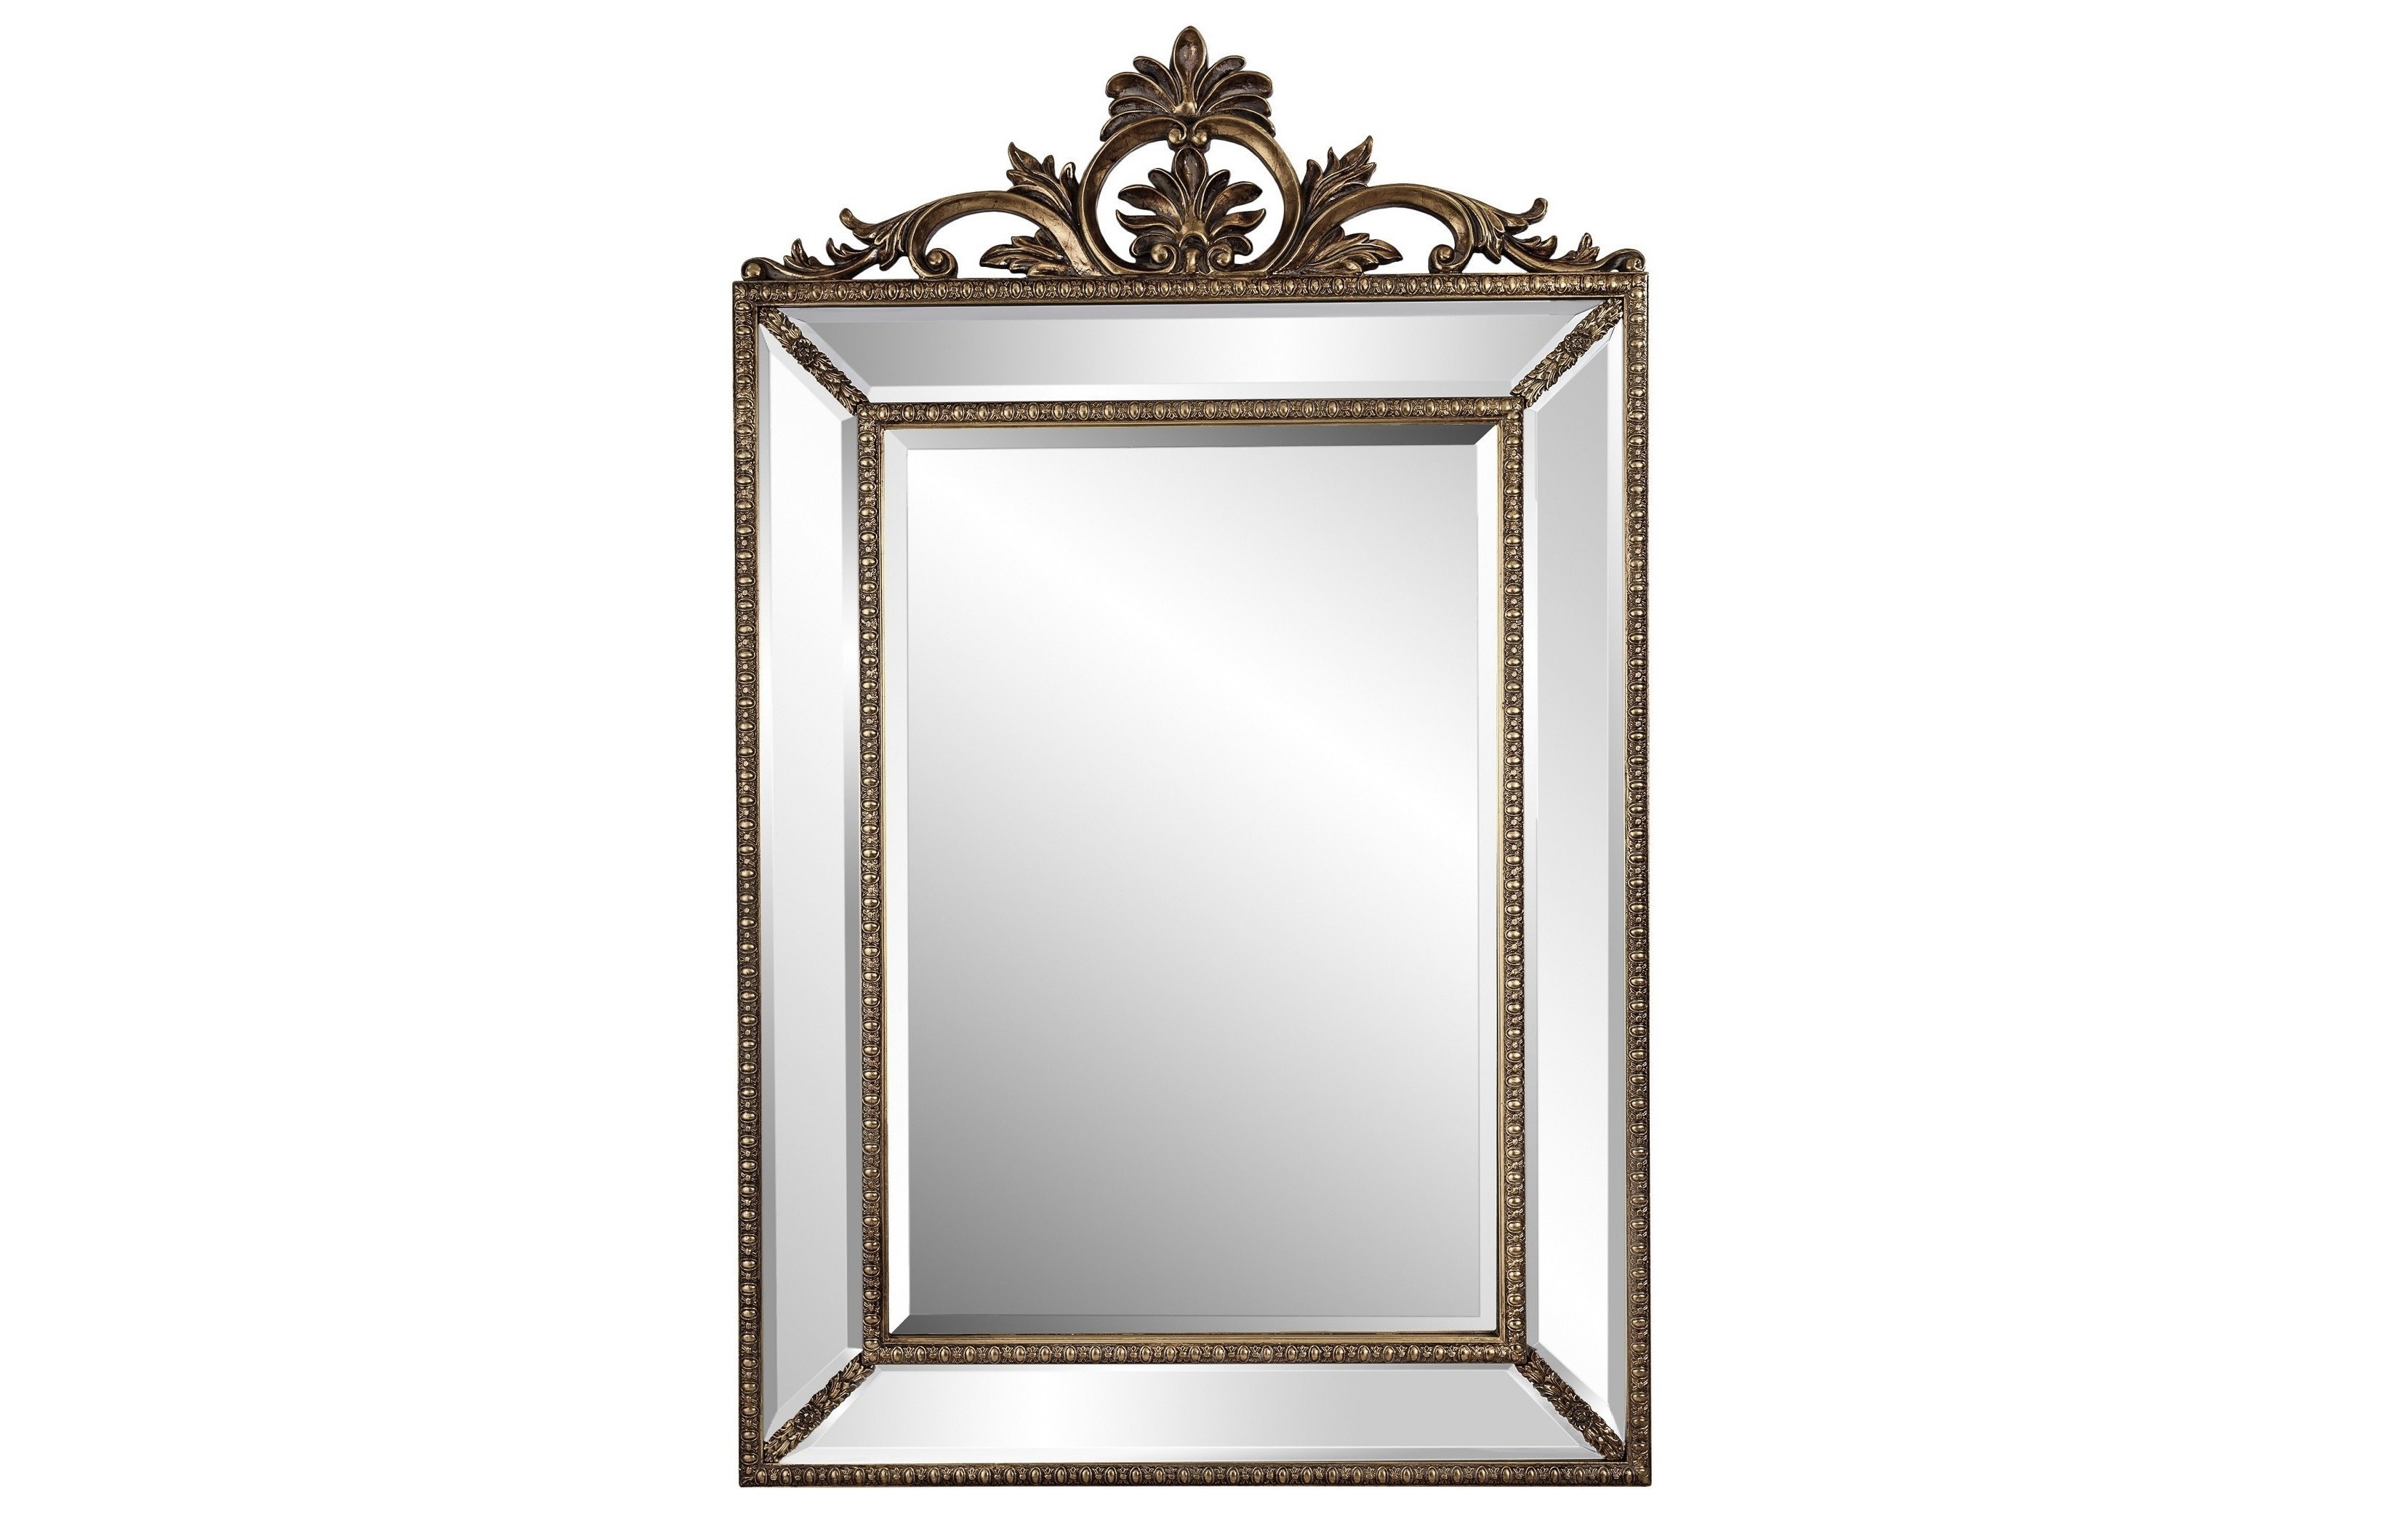 Зеркало Ambren SilverНастенные зеркала<br><br><br>Material: Полирезин<br>Ширина см: 90.0<br>Высота см: 144.0<br>Глубина см: 4.0